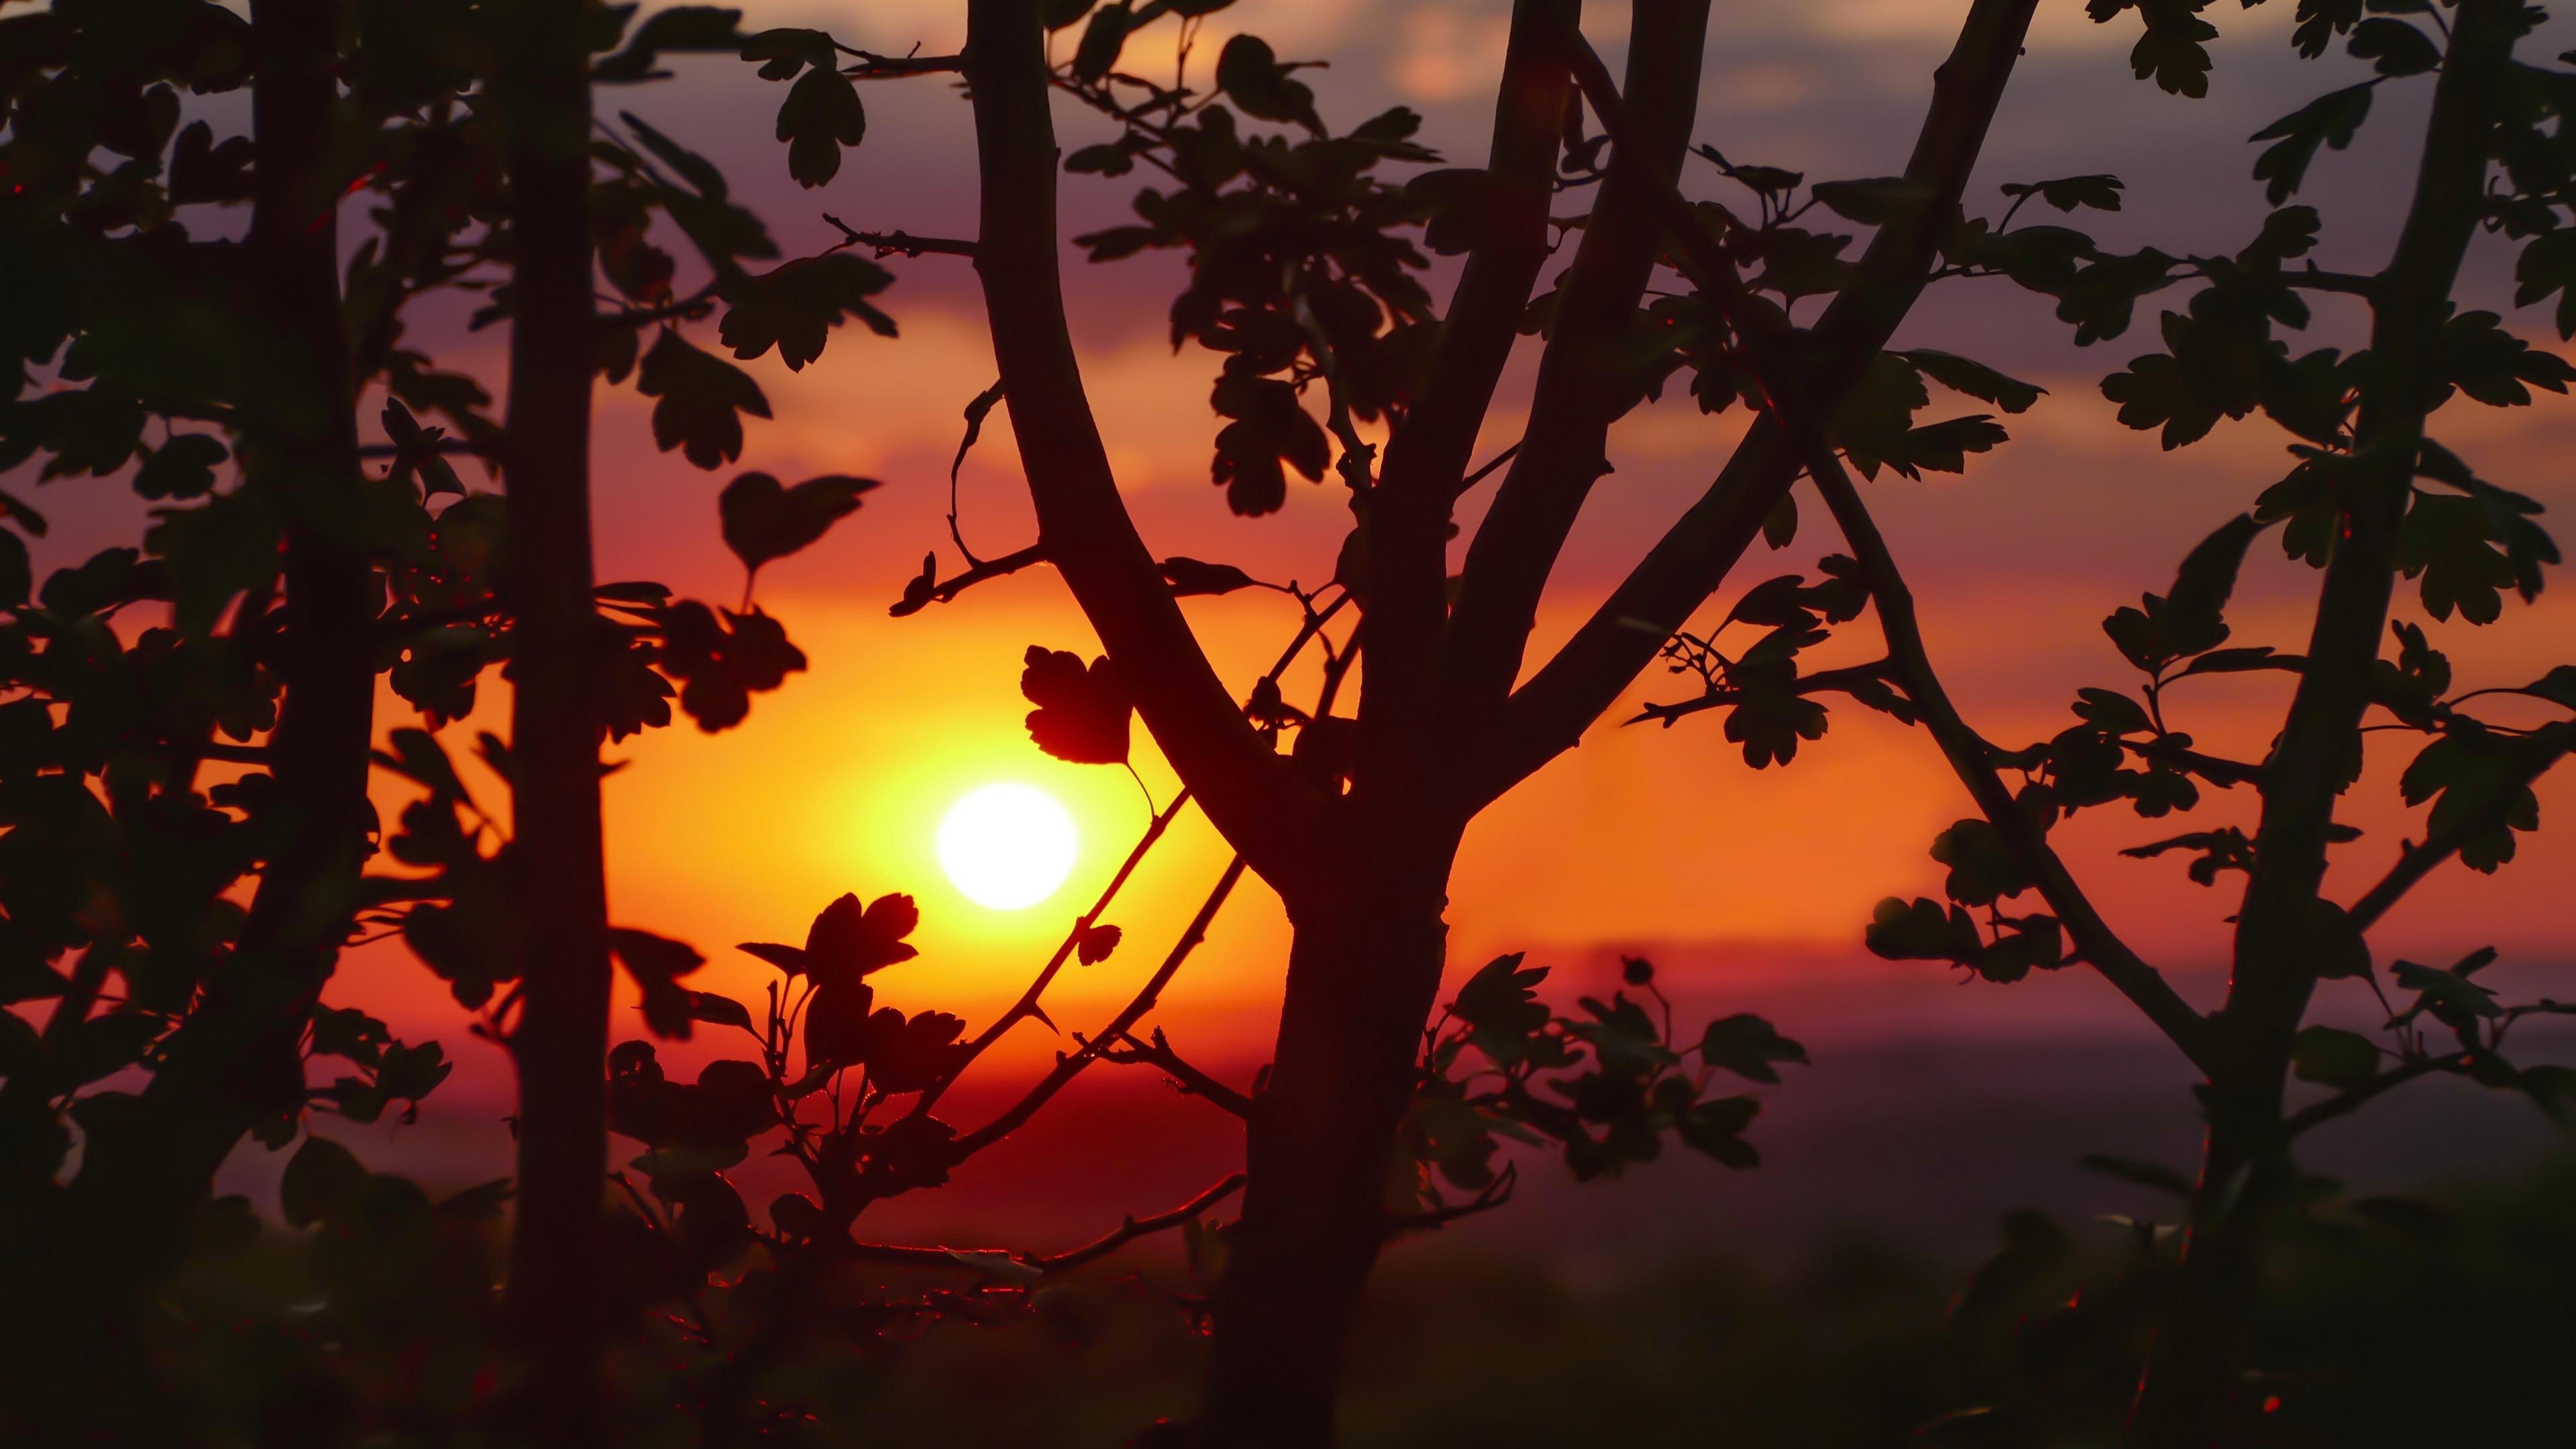 sunset branches leaves 4k 1541116069 - sunset, branches, leaves 4k - sunset, Leaves, branches